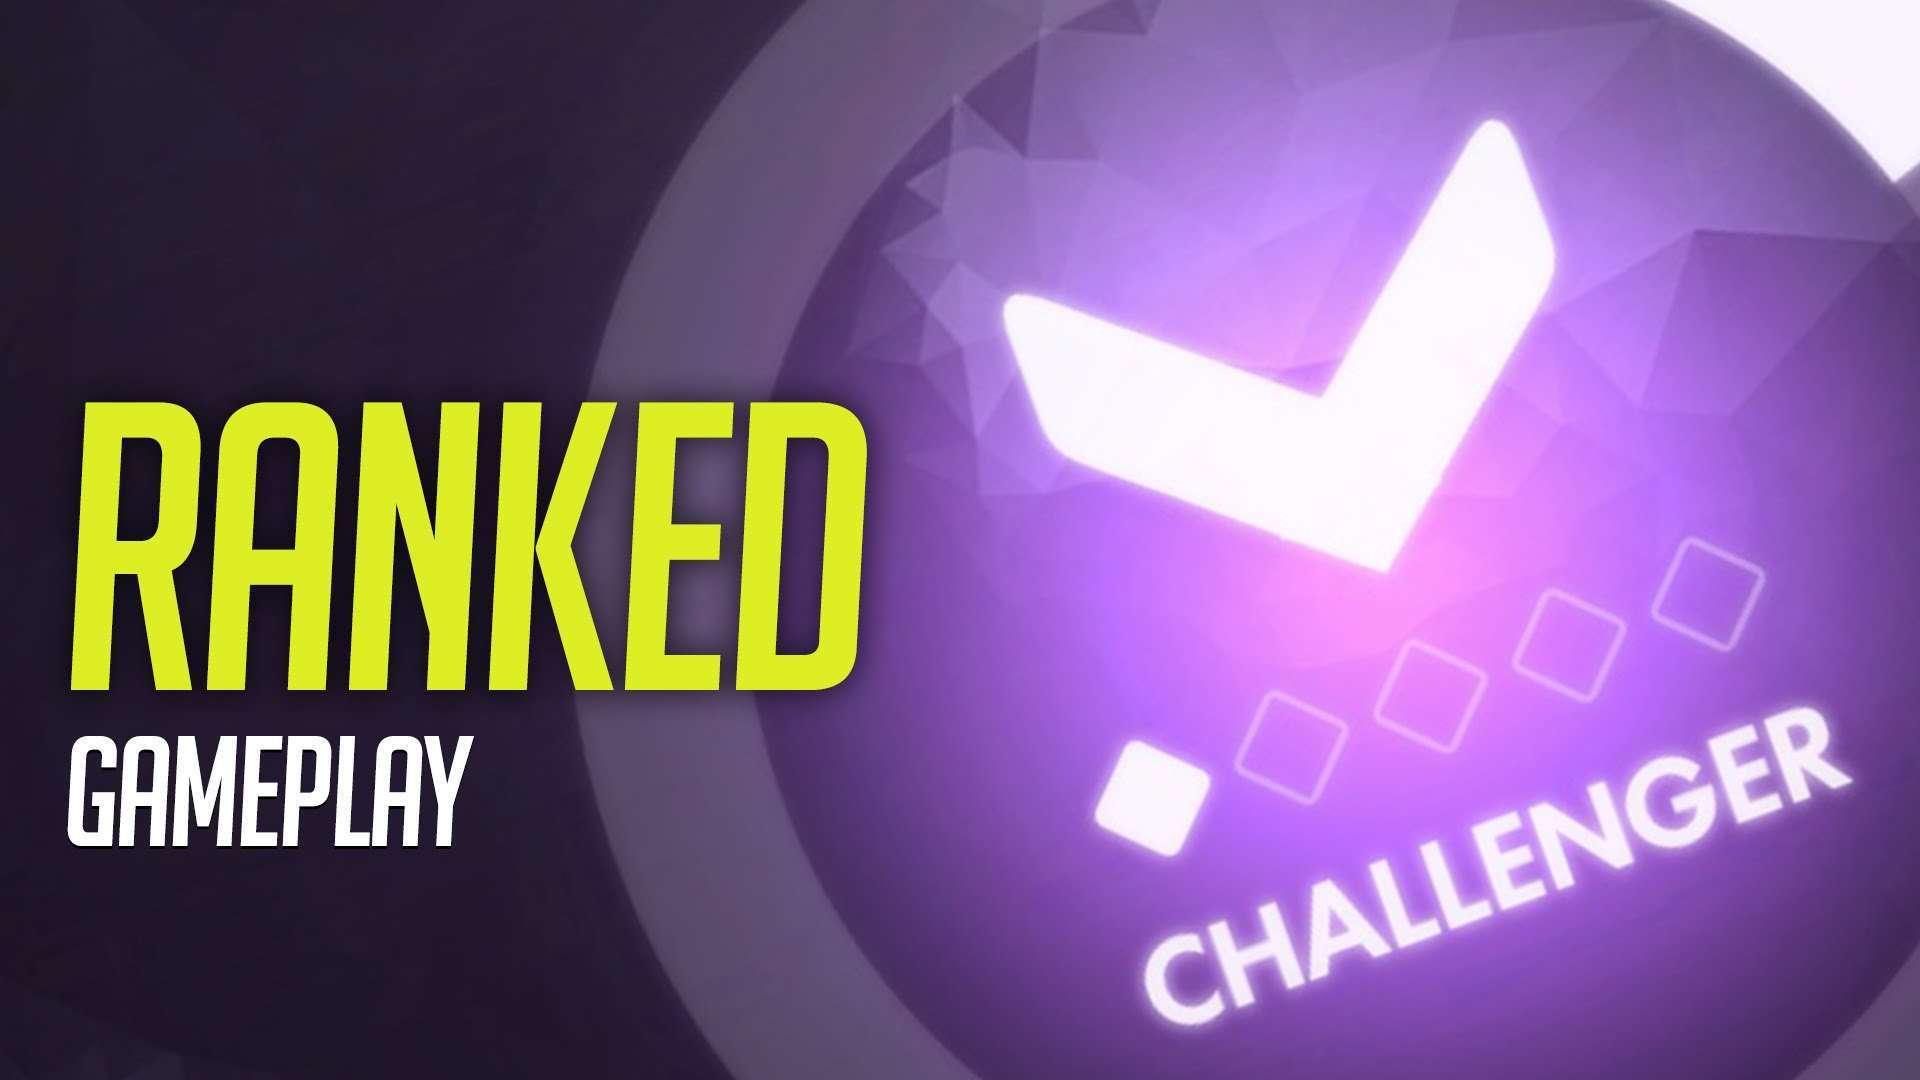 Overwatch - Ranked Gameplay